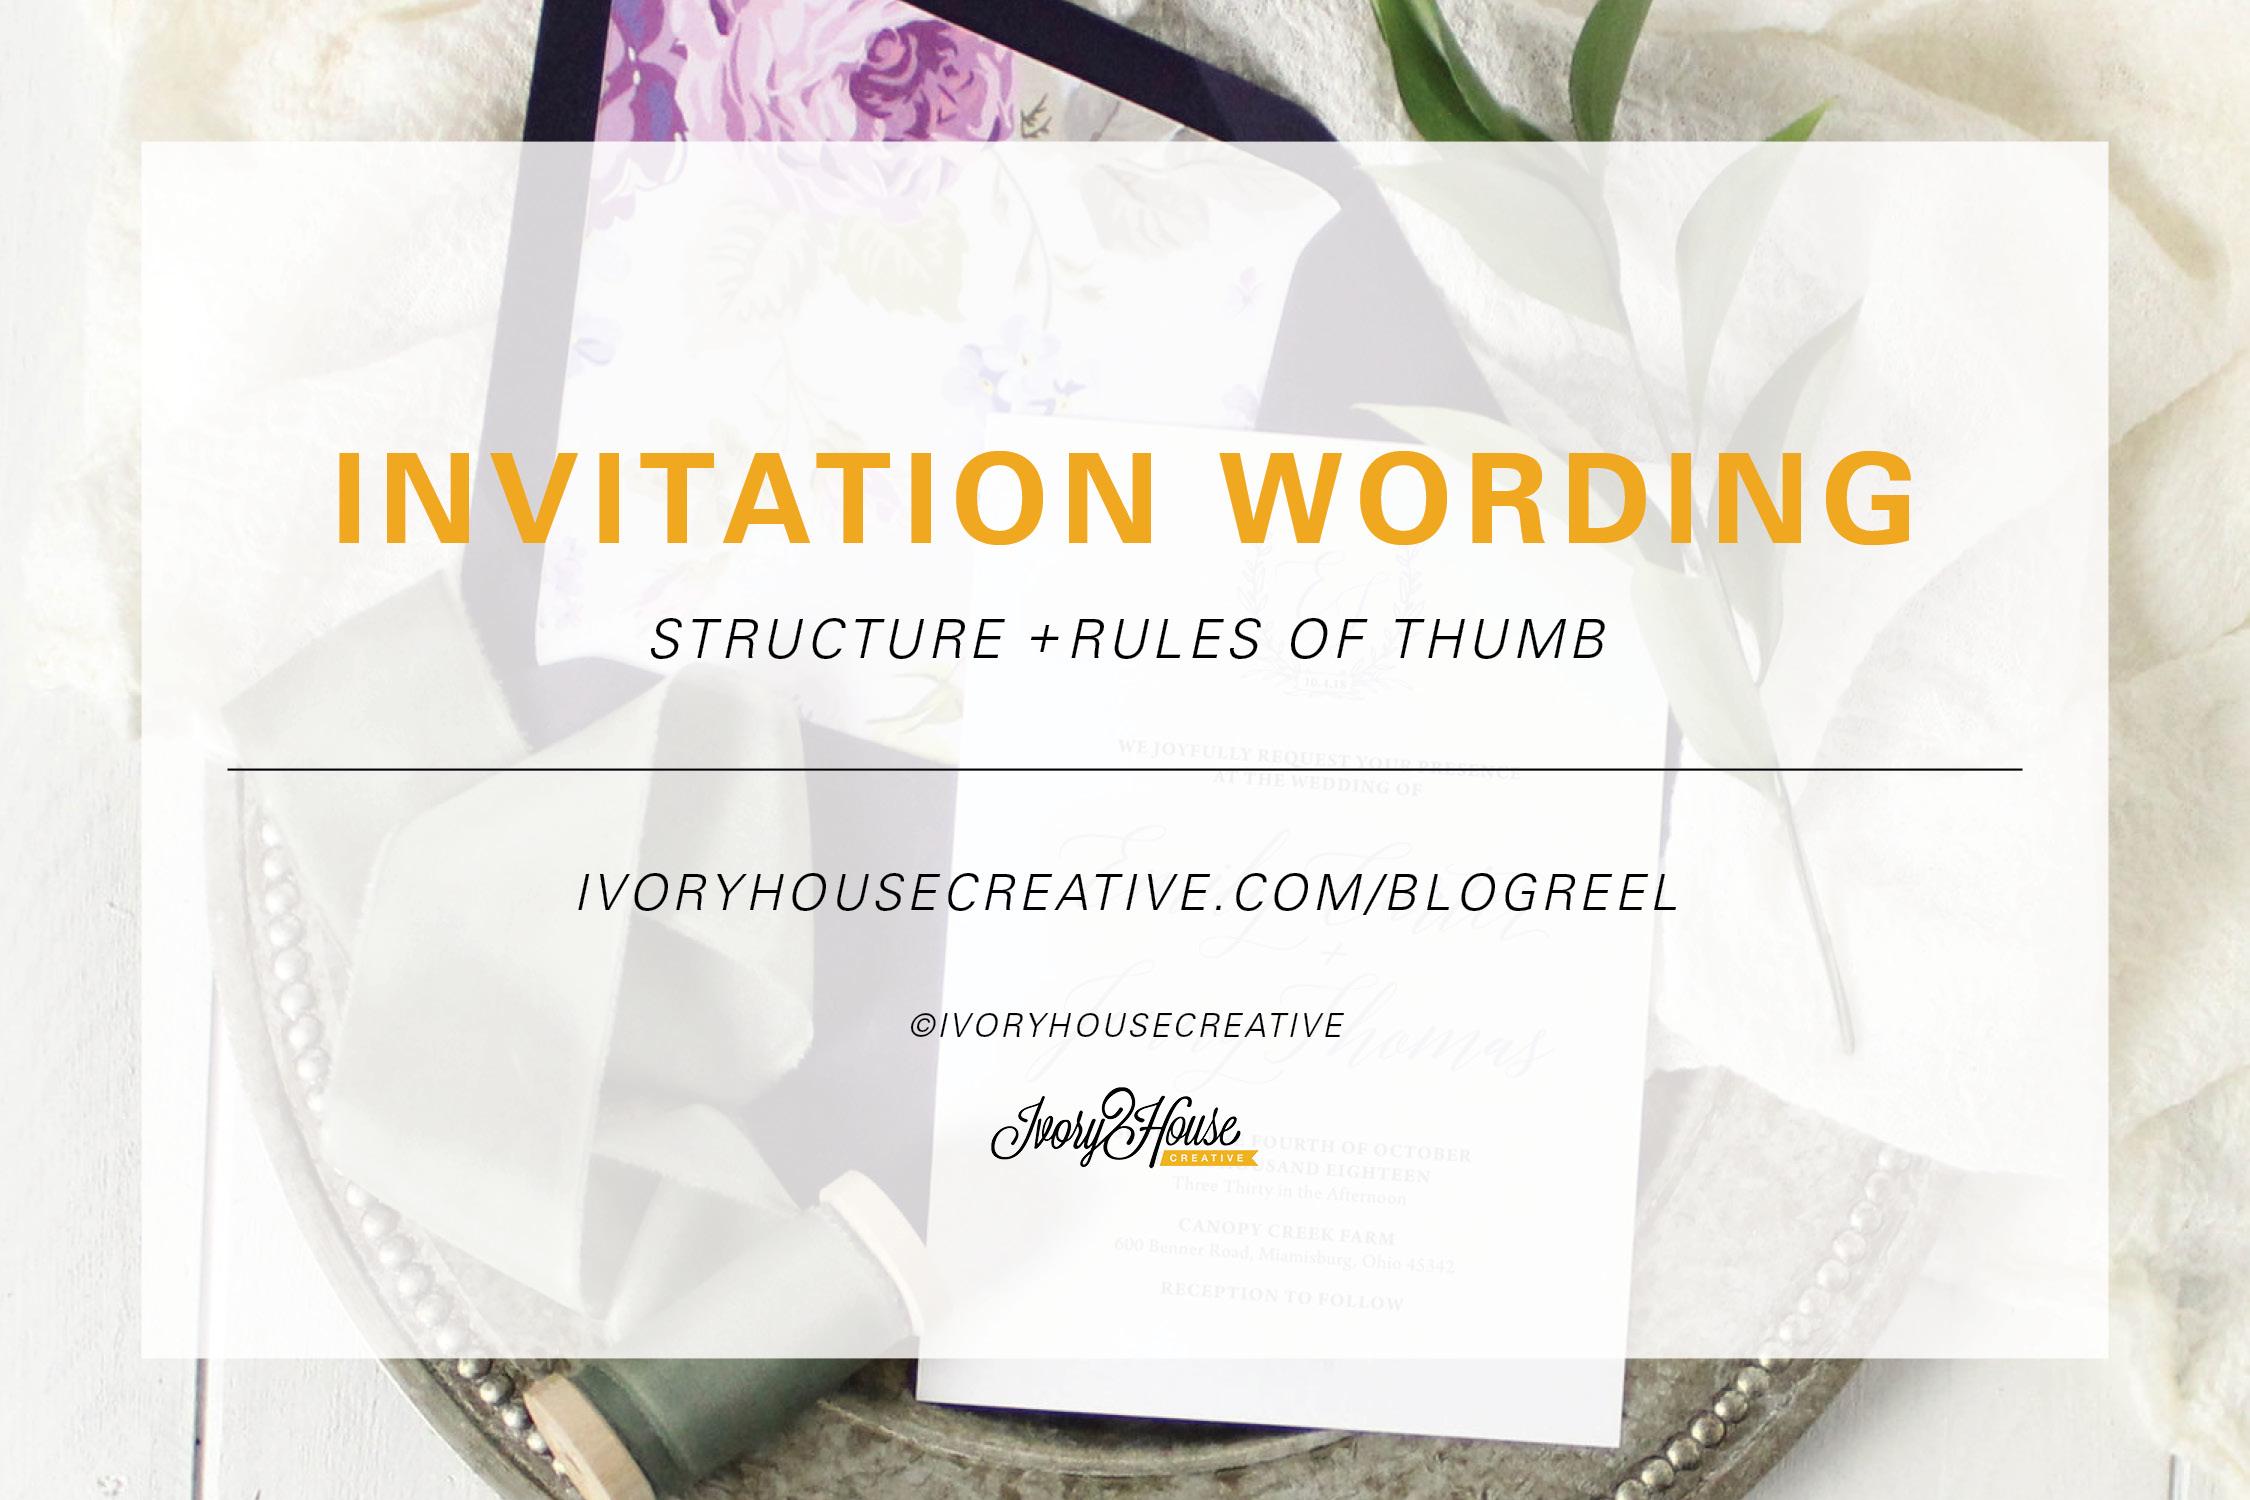 Invitation Wording - Blog Photo2.jpg